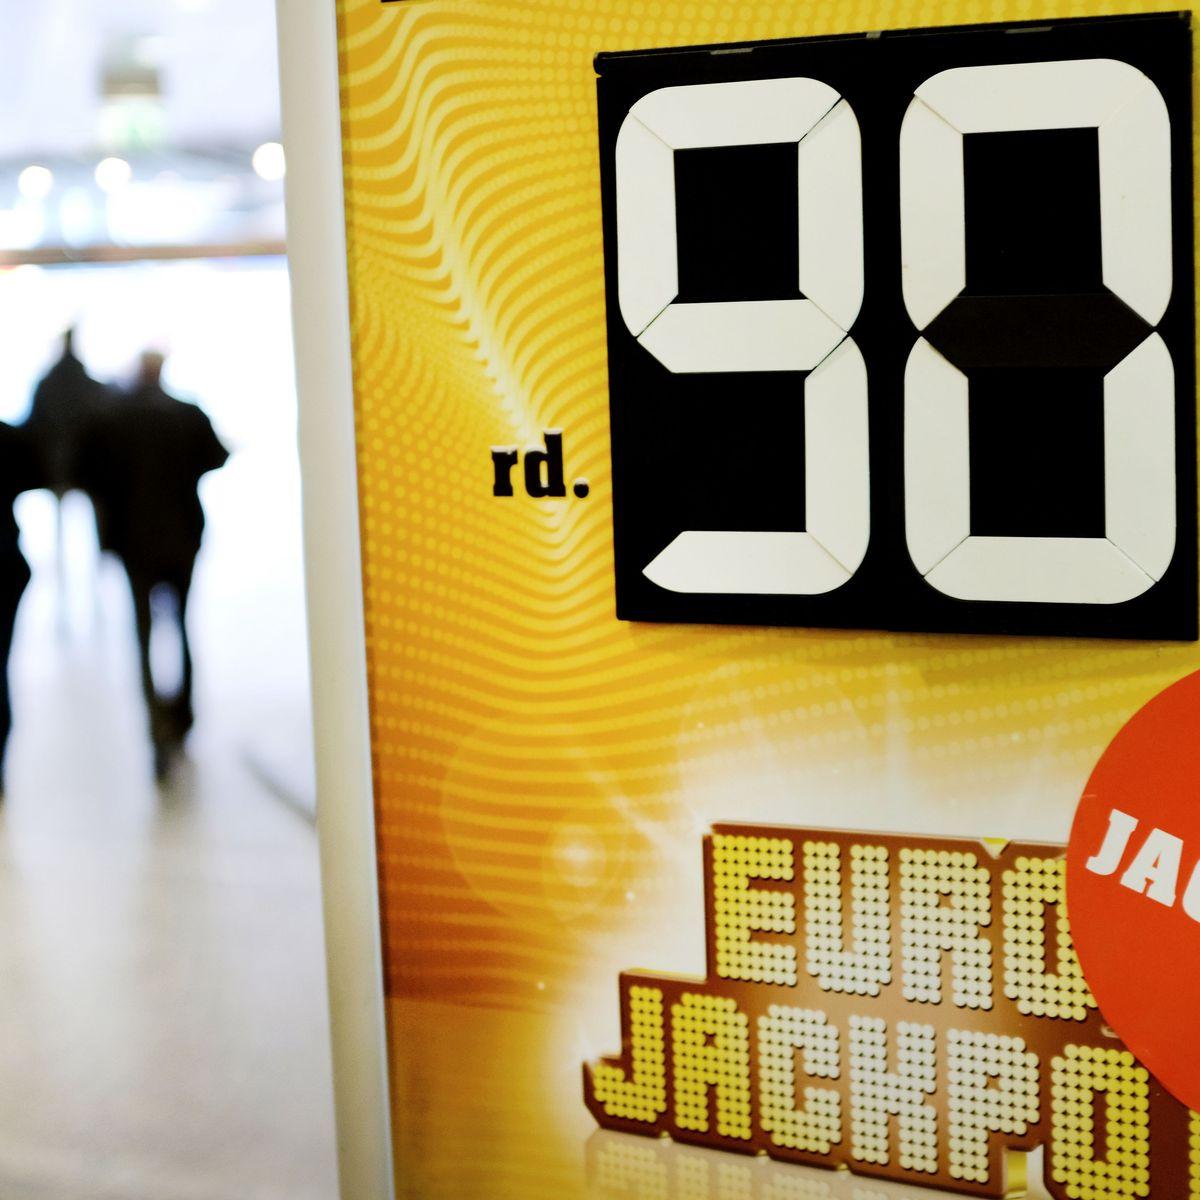 euro jackpot zahlen prüfen